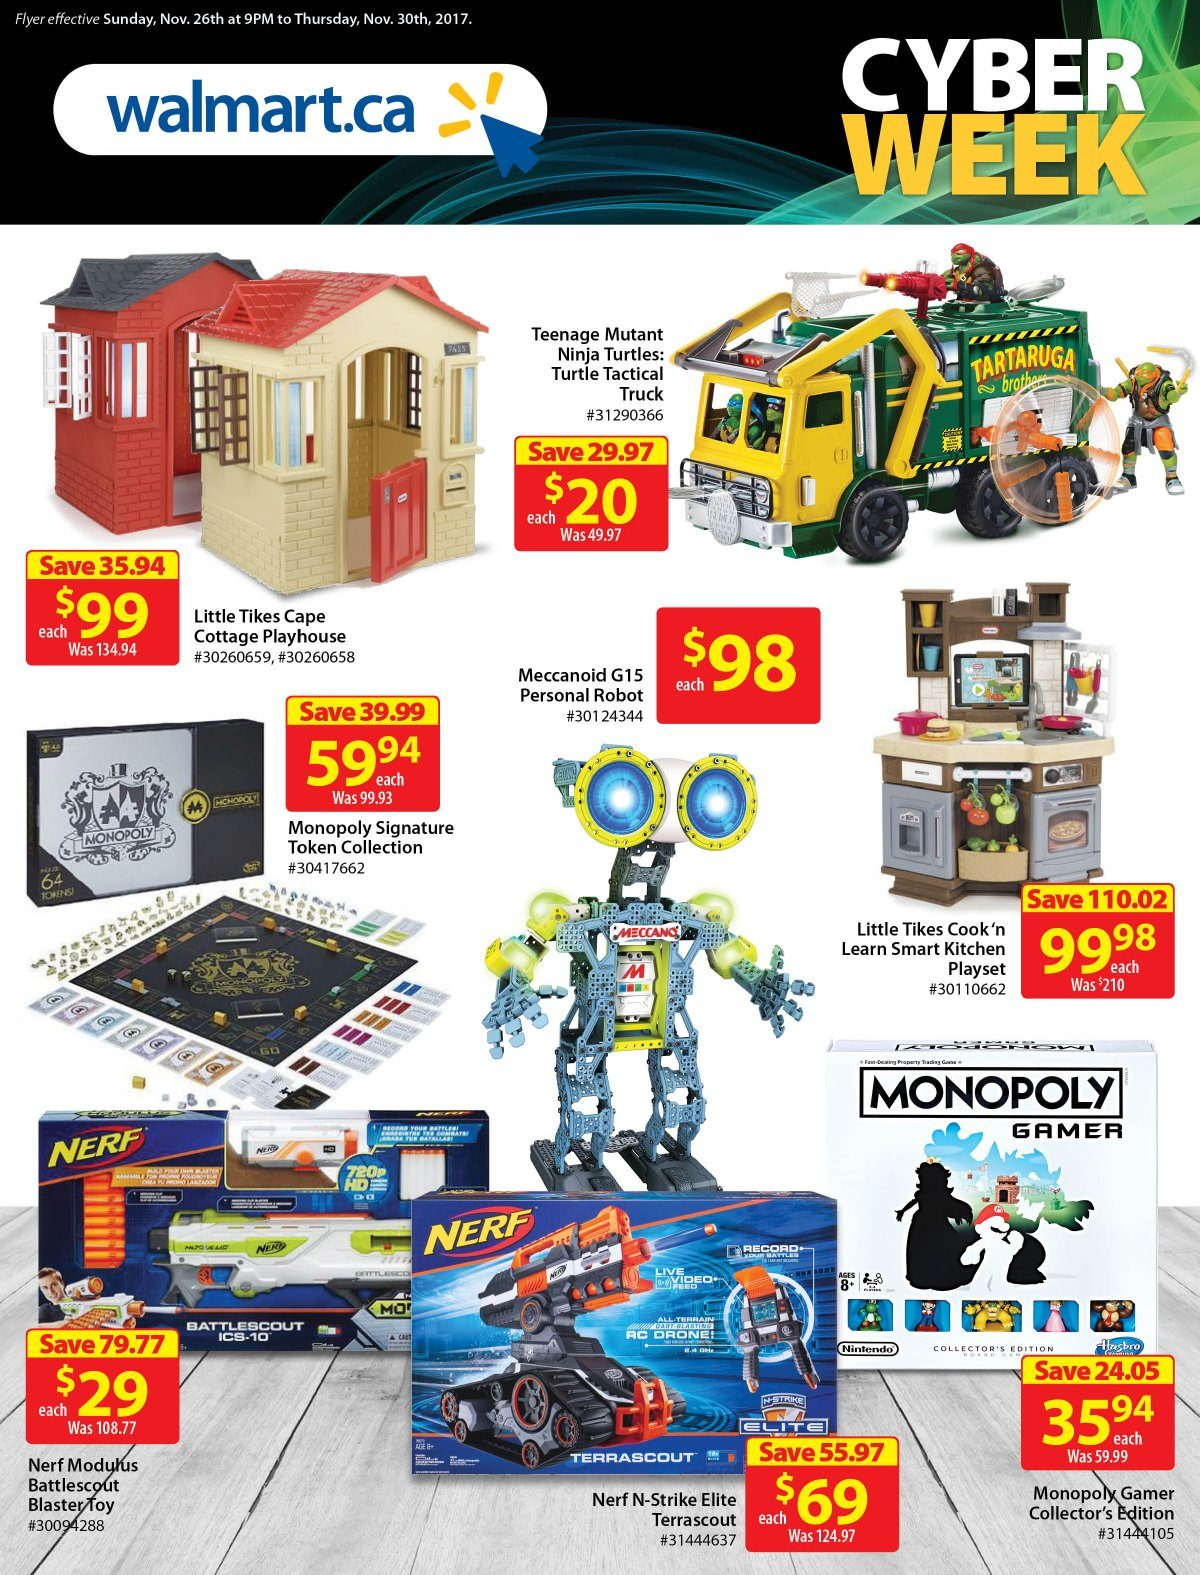 Walmart Weekly Flyer - Cyber Monday & Cyber Week - Nov 26